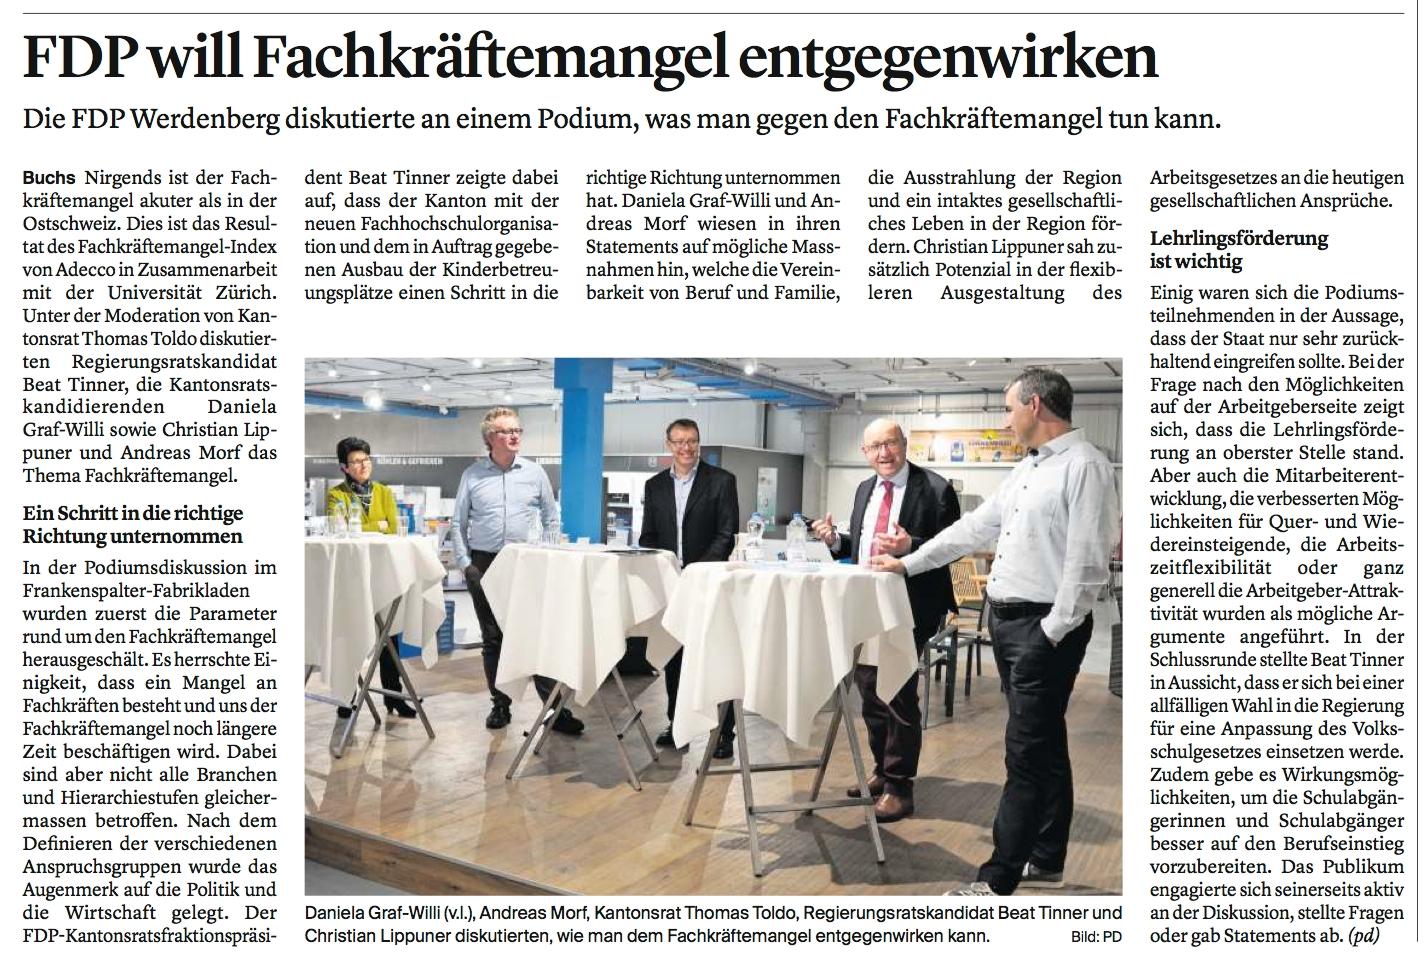 FDP will Fachkräftemangel entgegenwirken